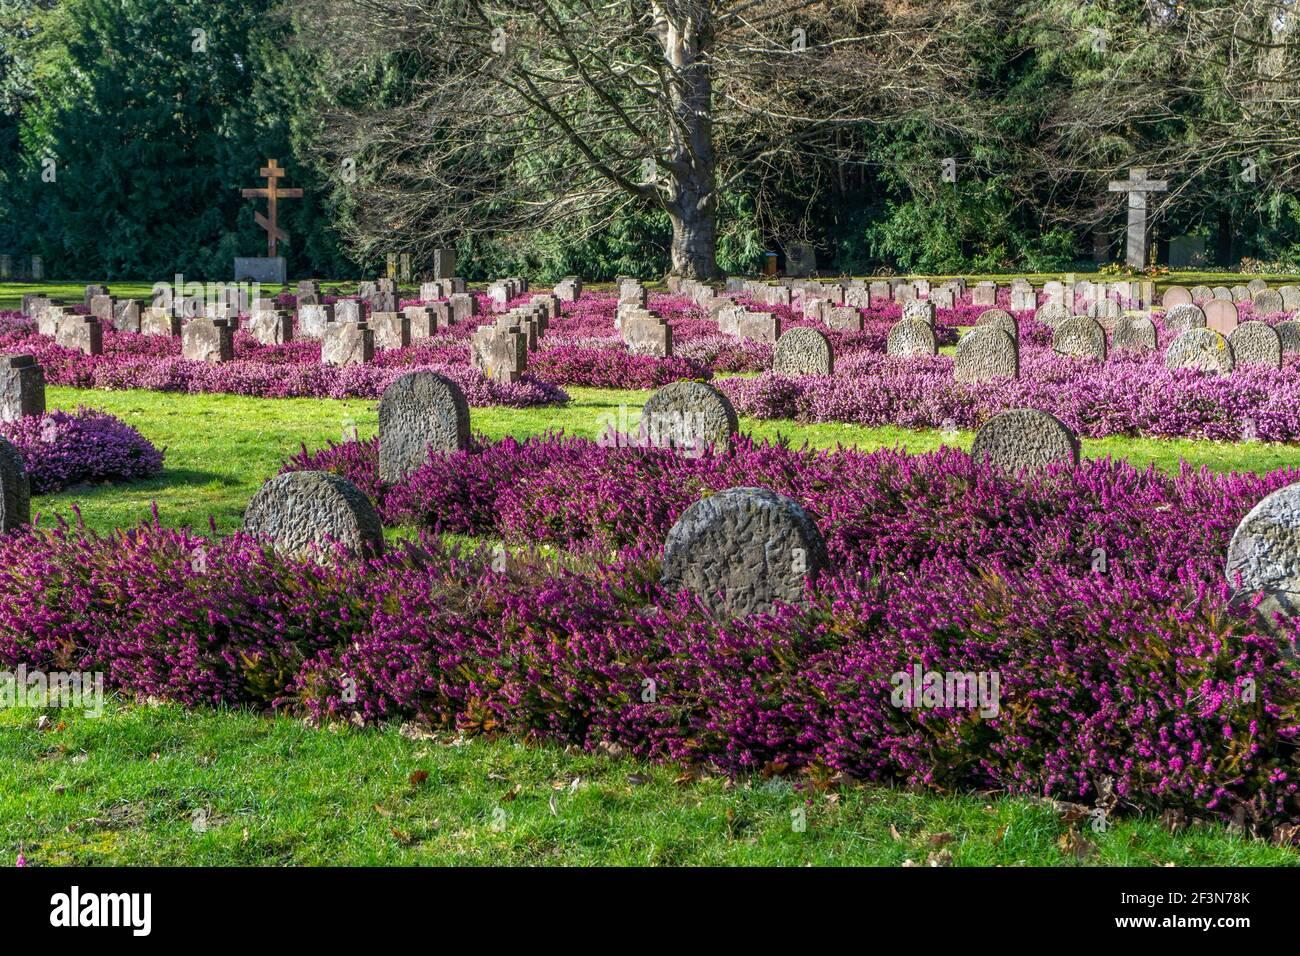 Violette Erika zwischen Weltkriegsgräbern auf dem Stadtfriedhof Göttingen, Niedersachsen, Deutschland | Violet Erica entre les tombes commémoratives de guerre Banque D'Images